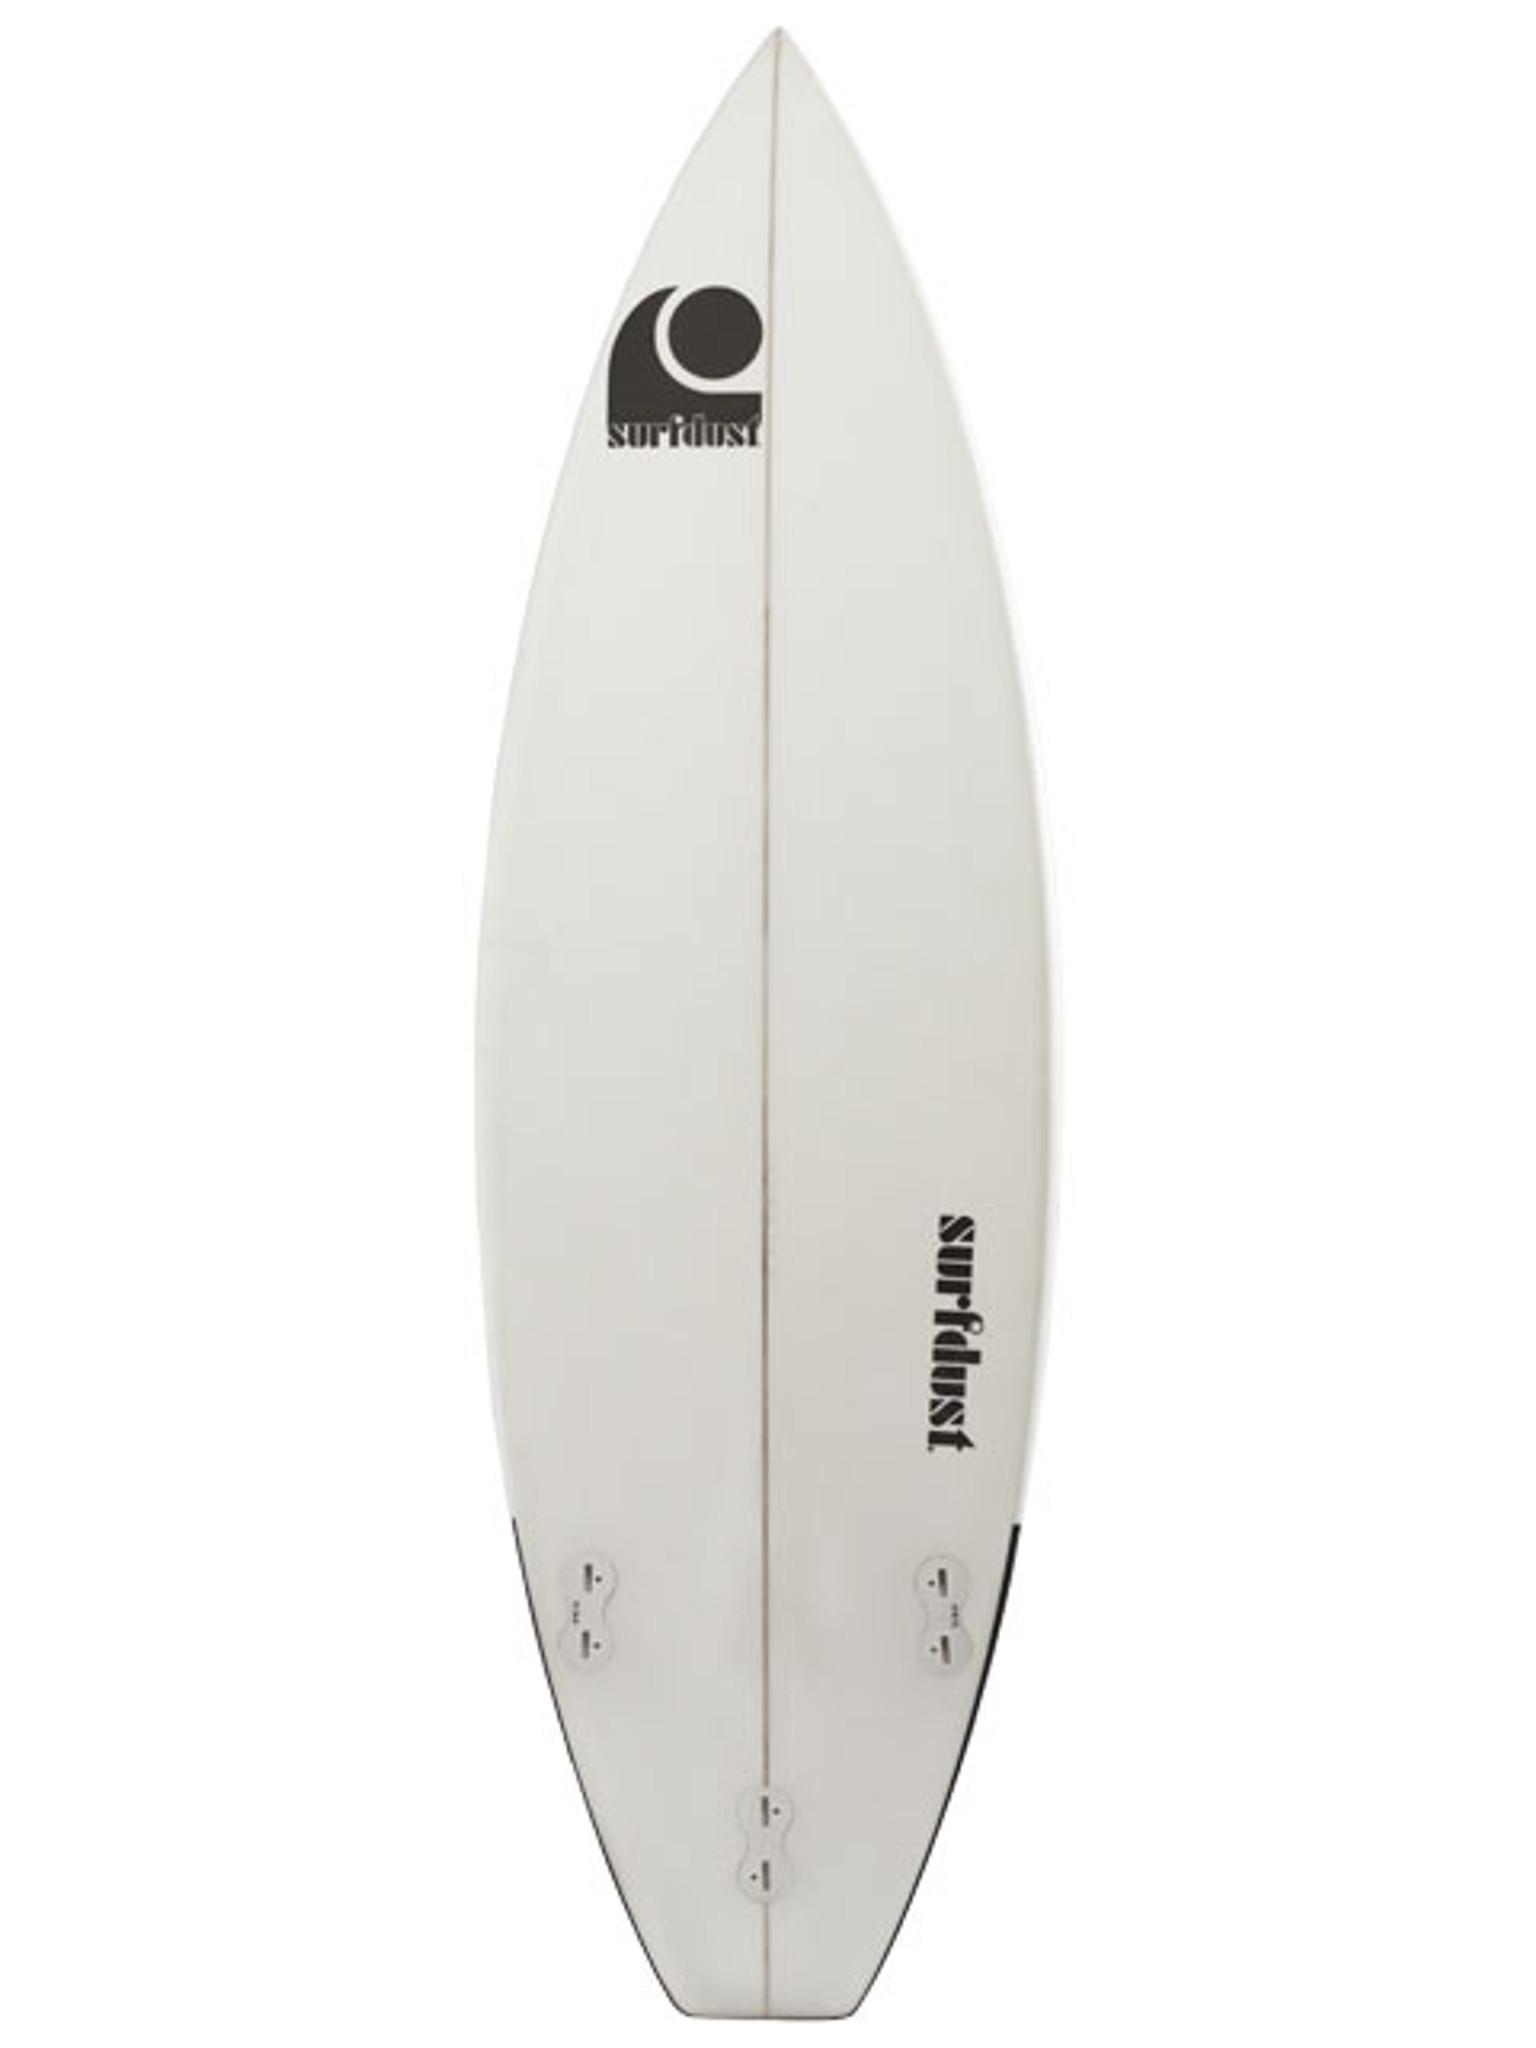 5.4ft PRO Grom Series Surfboards SURFDUST